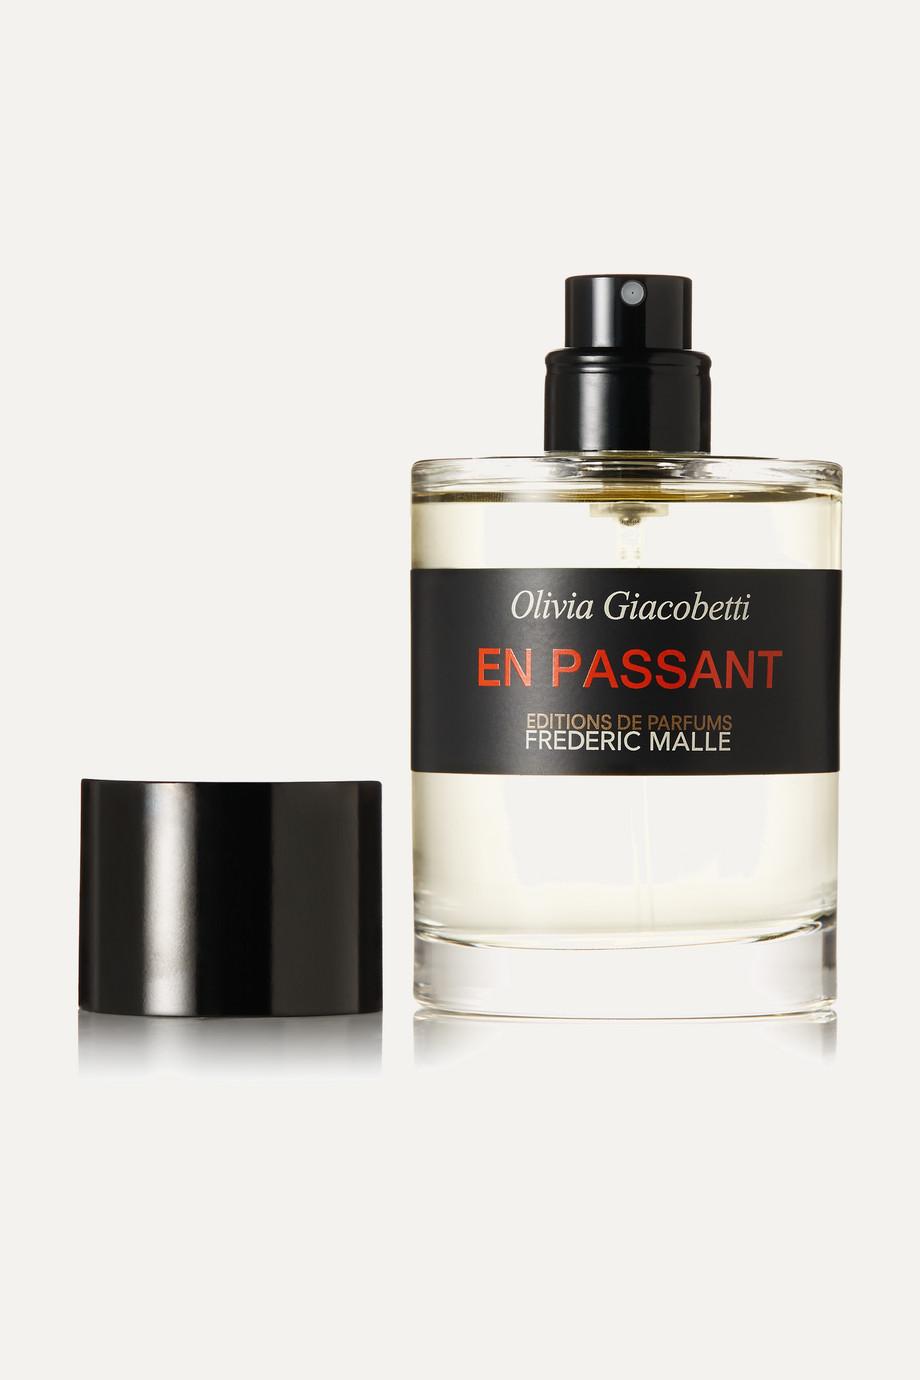 Frederic Malle En Passant – Gurke & Weißer Flieder, 100 ml – Eau de Parfum